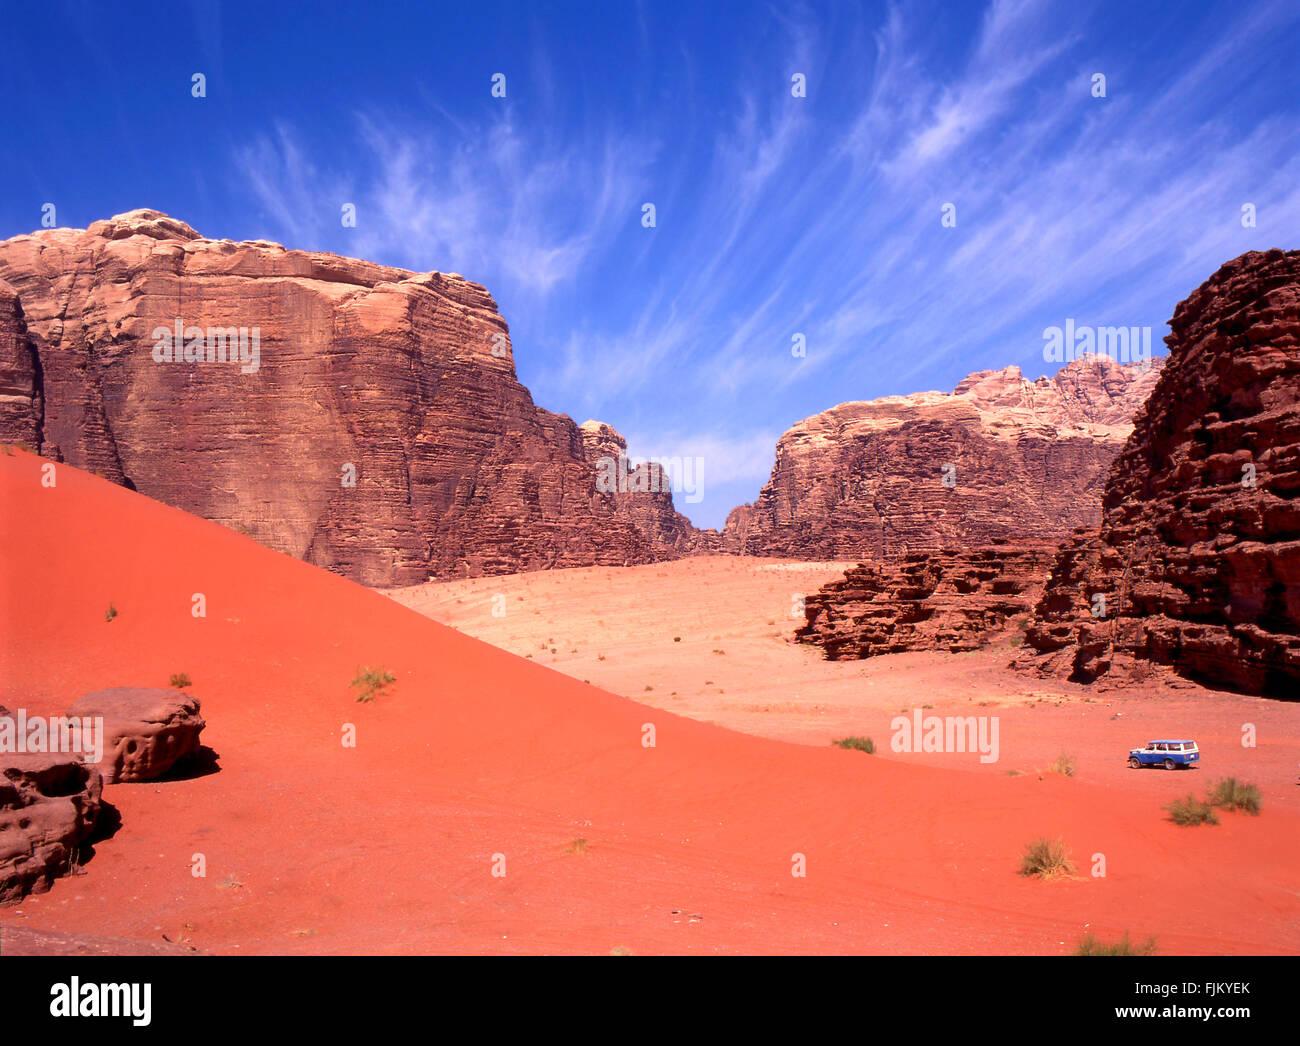 Exploring with a four wheel drive the Wadi rum desert in Jordan - Stock Image